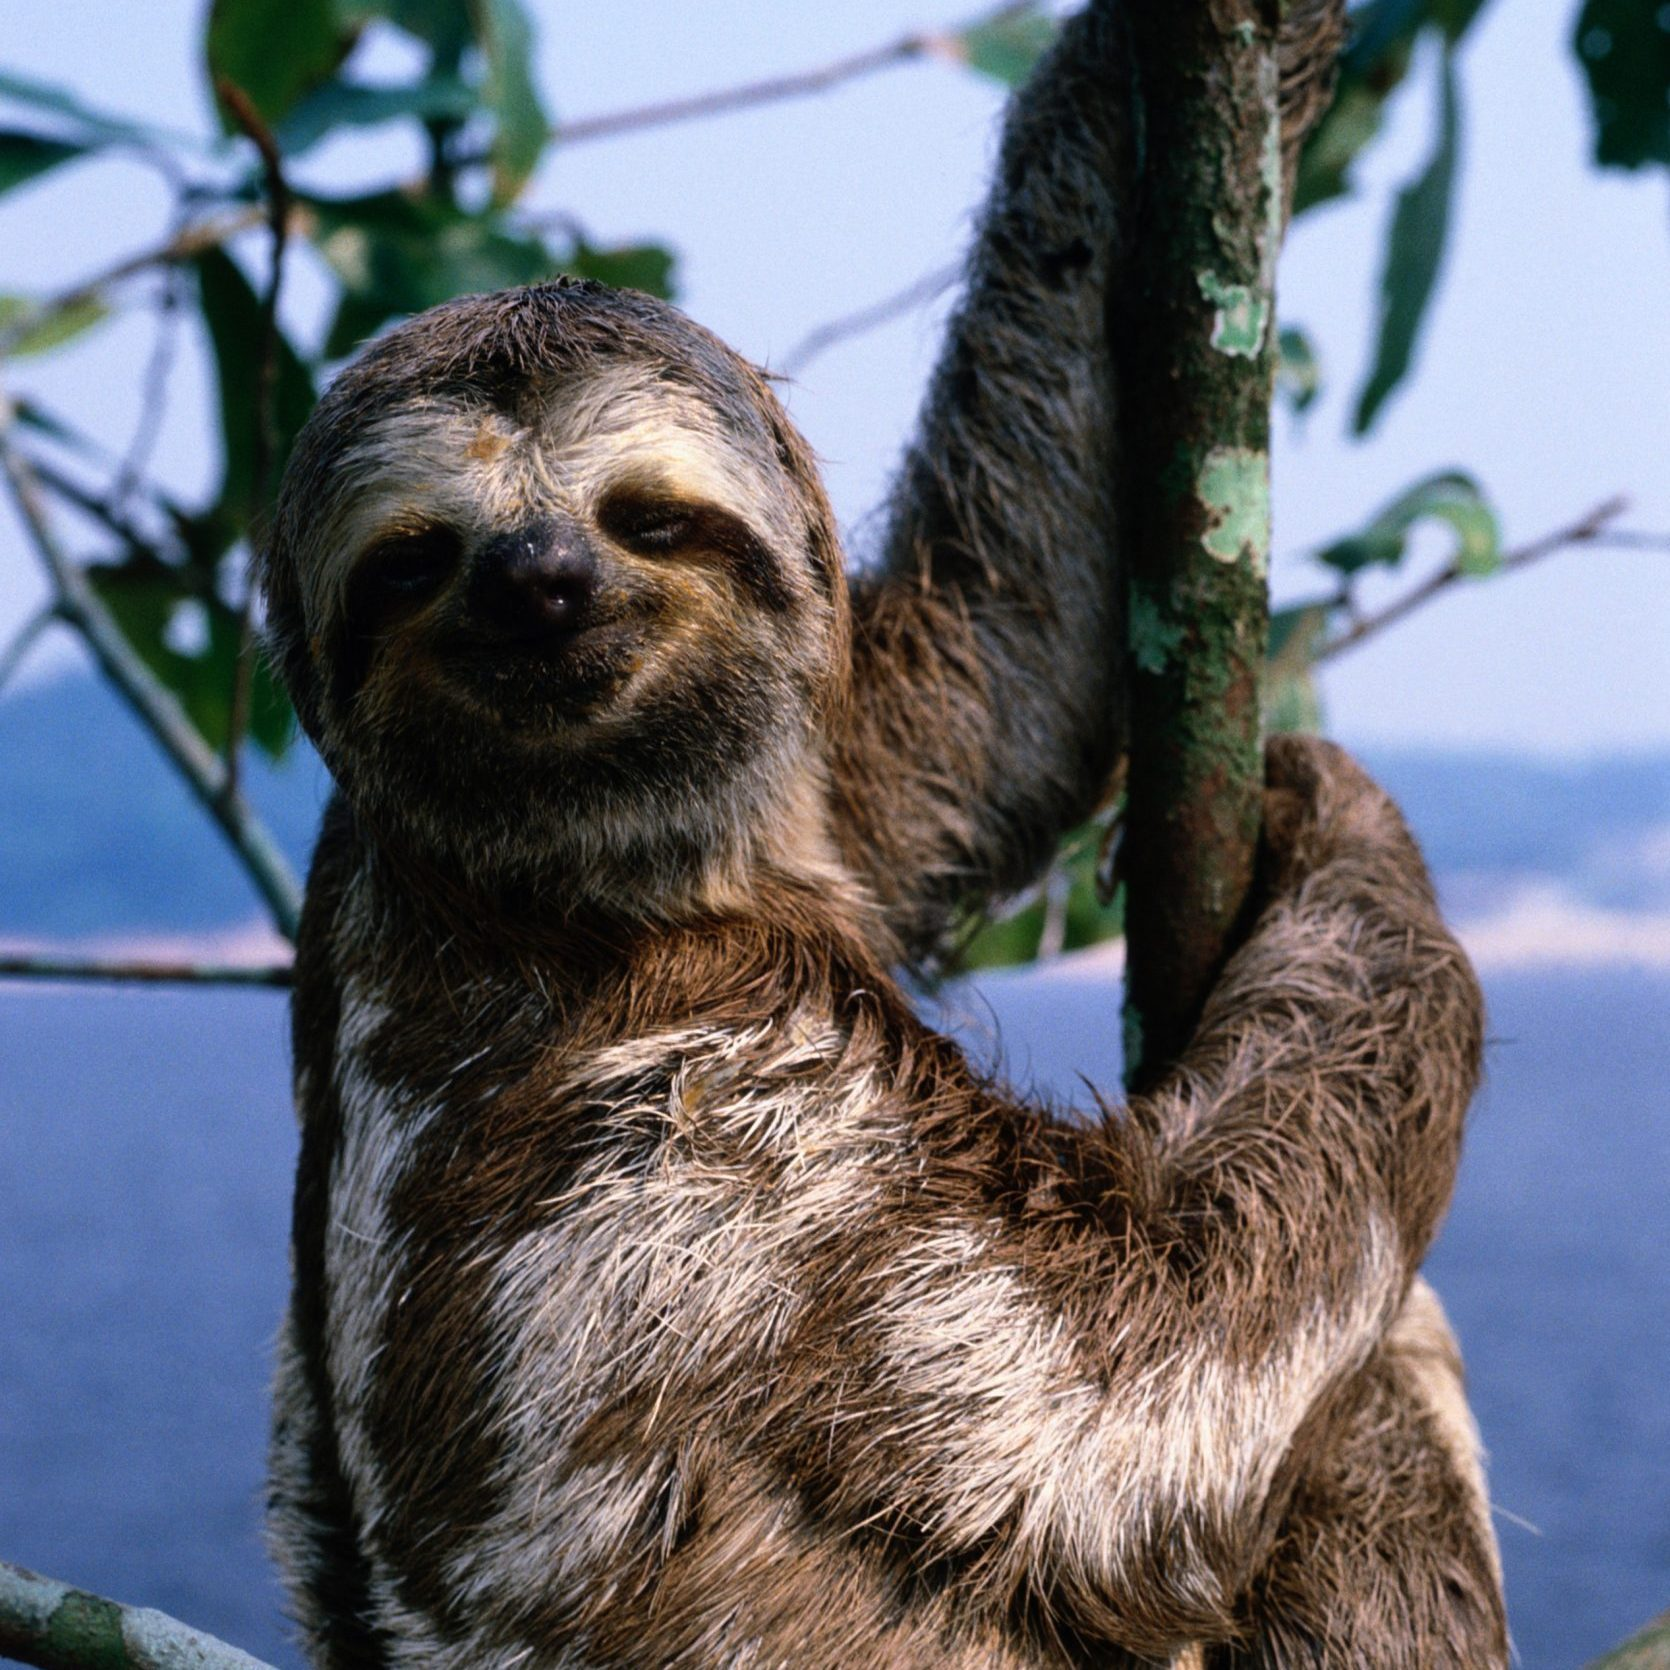 Three-toed sloth (Bradypus tridactylus) Amazon River, Brazil